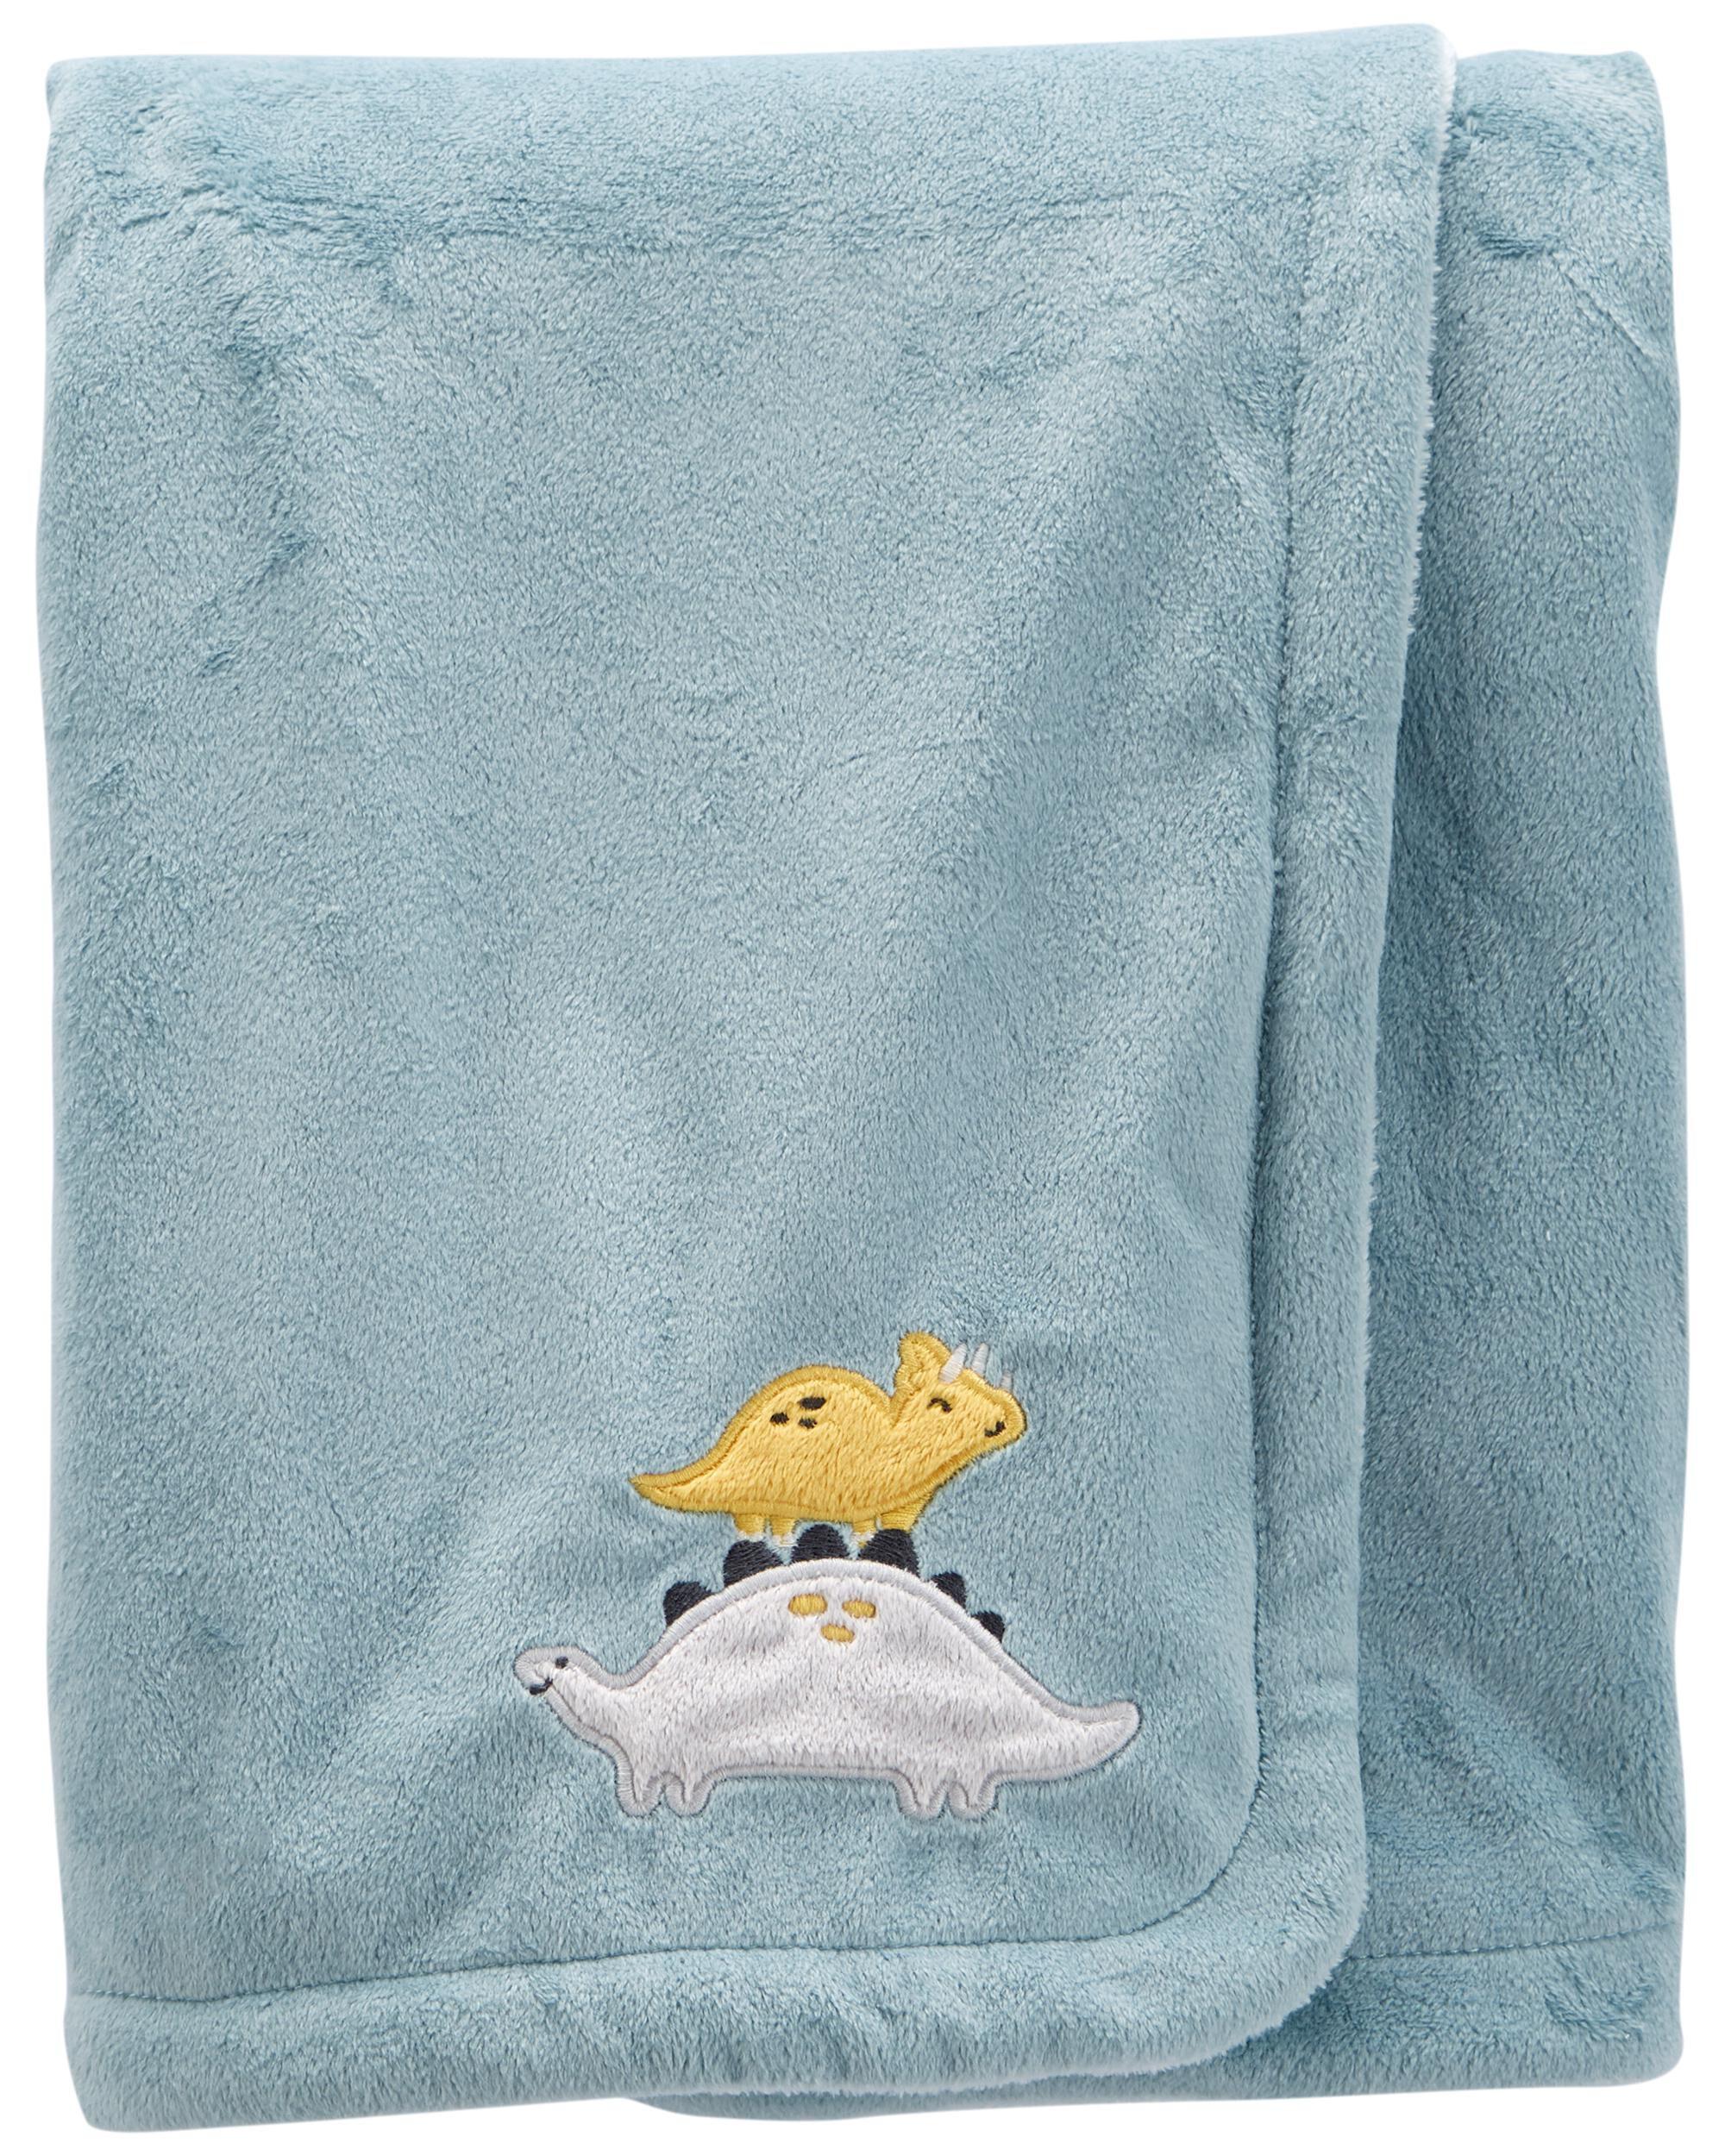 Carters Dinosaur Fuzzy Plush Blanket